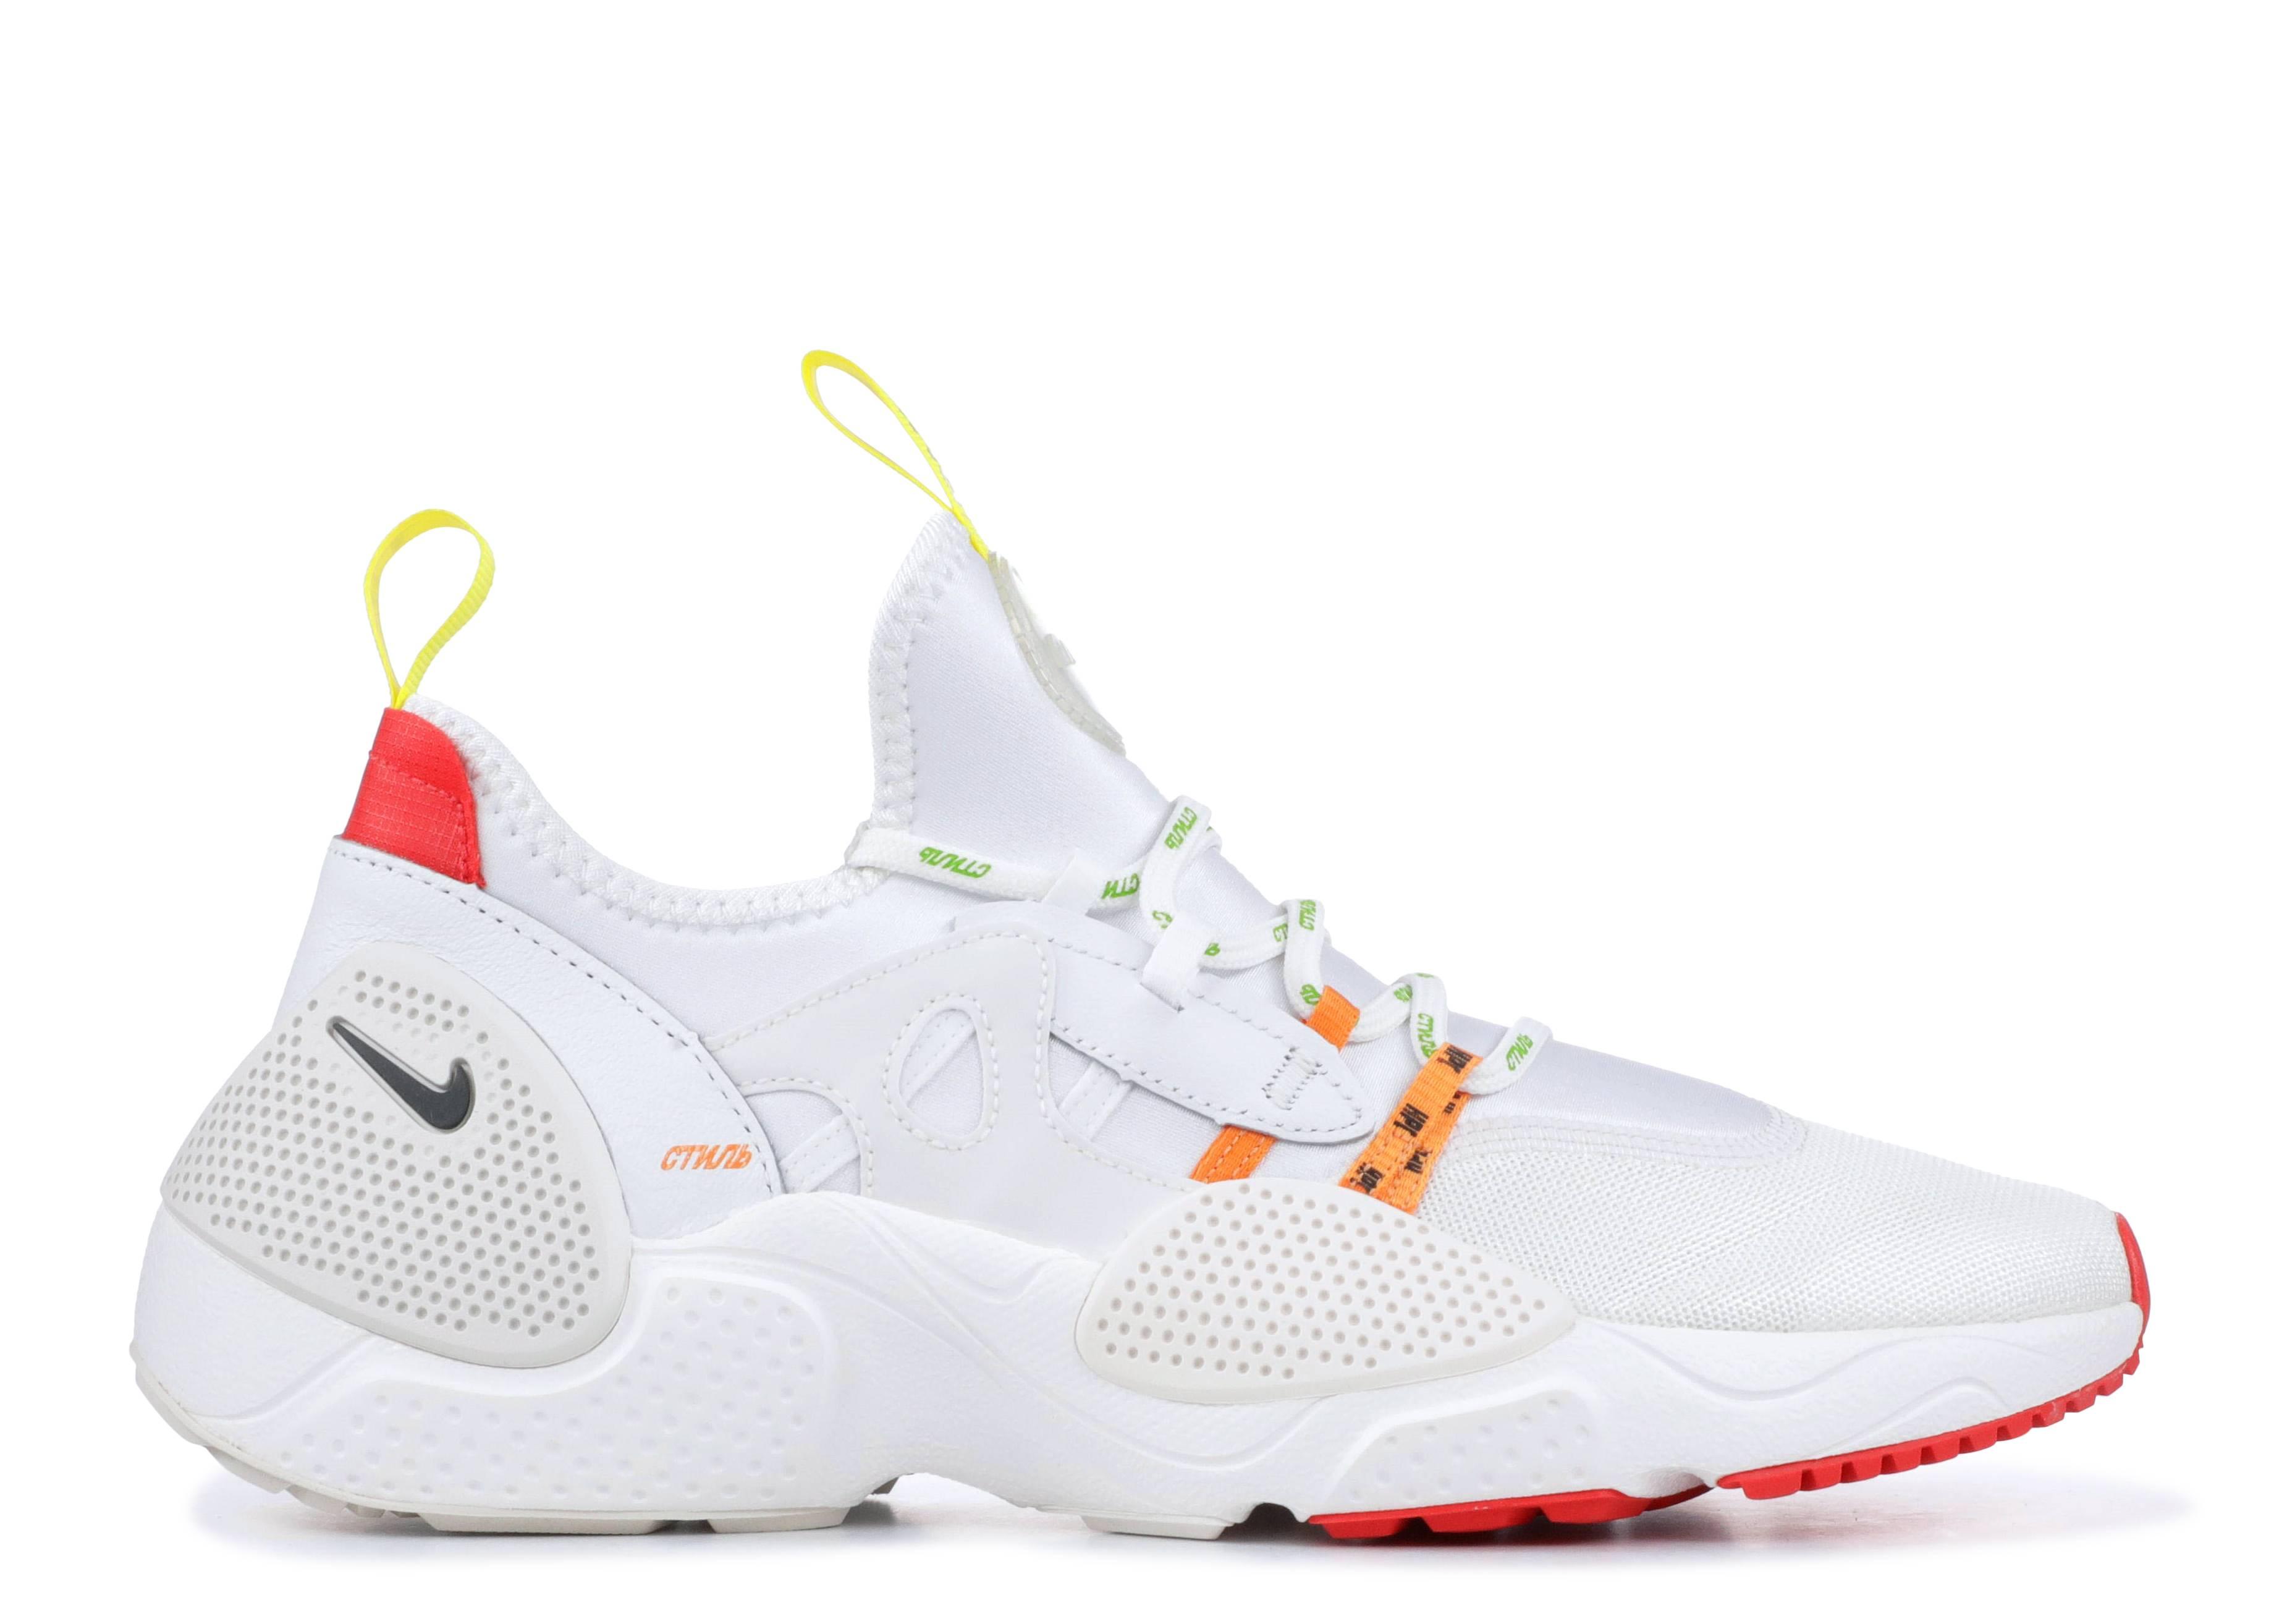 549c81d1110ae Nike Huaraches Shoes for Women   Men